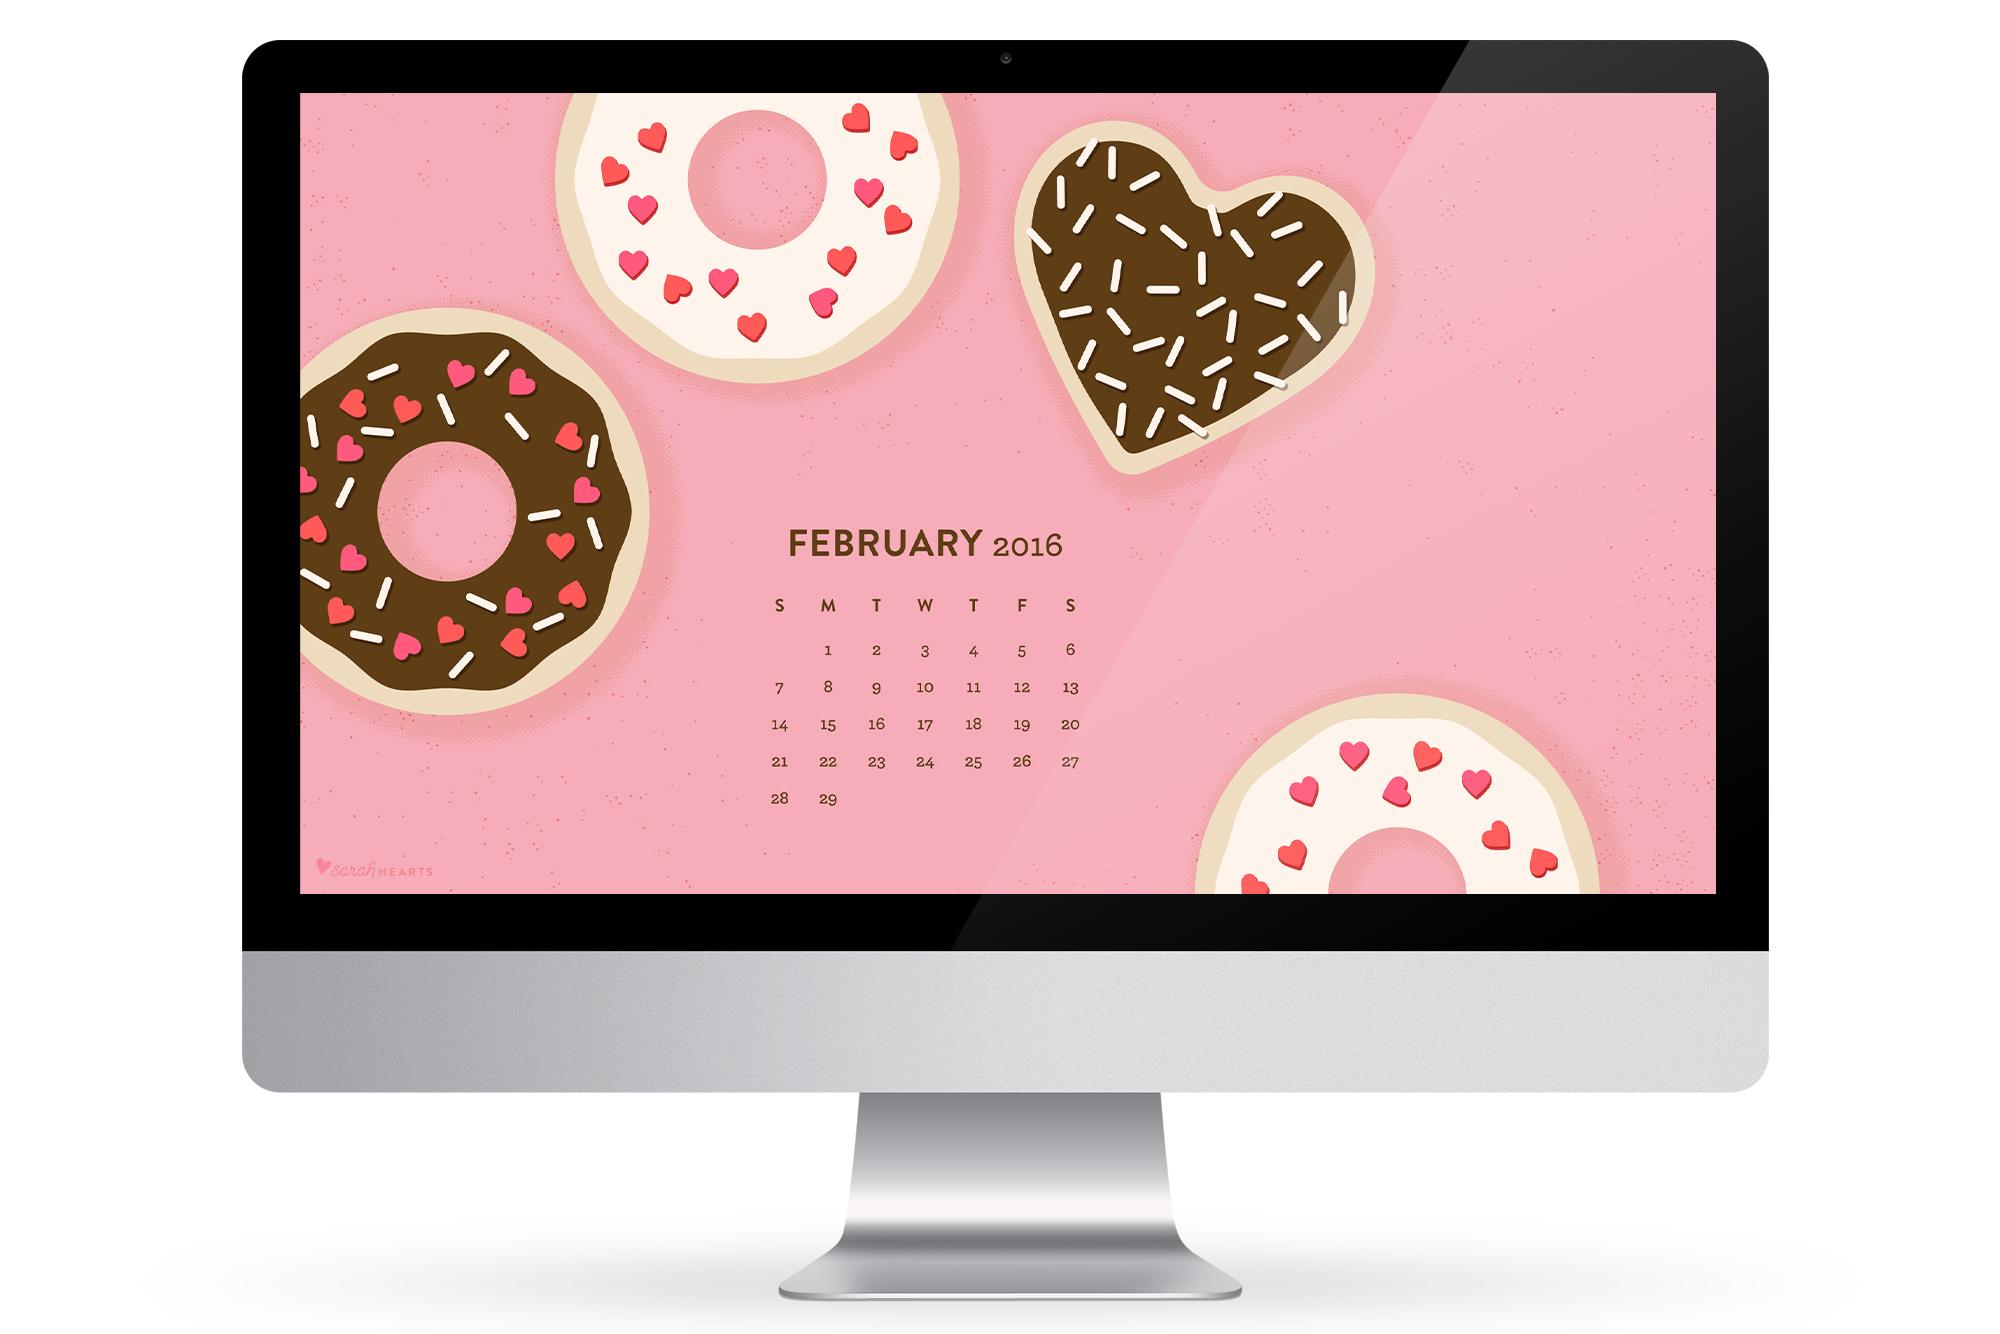 February 2016 Calendar Wallpaper   Sarah Hearts 2000x1334